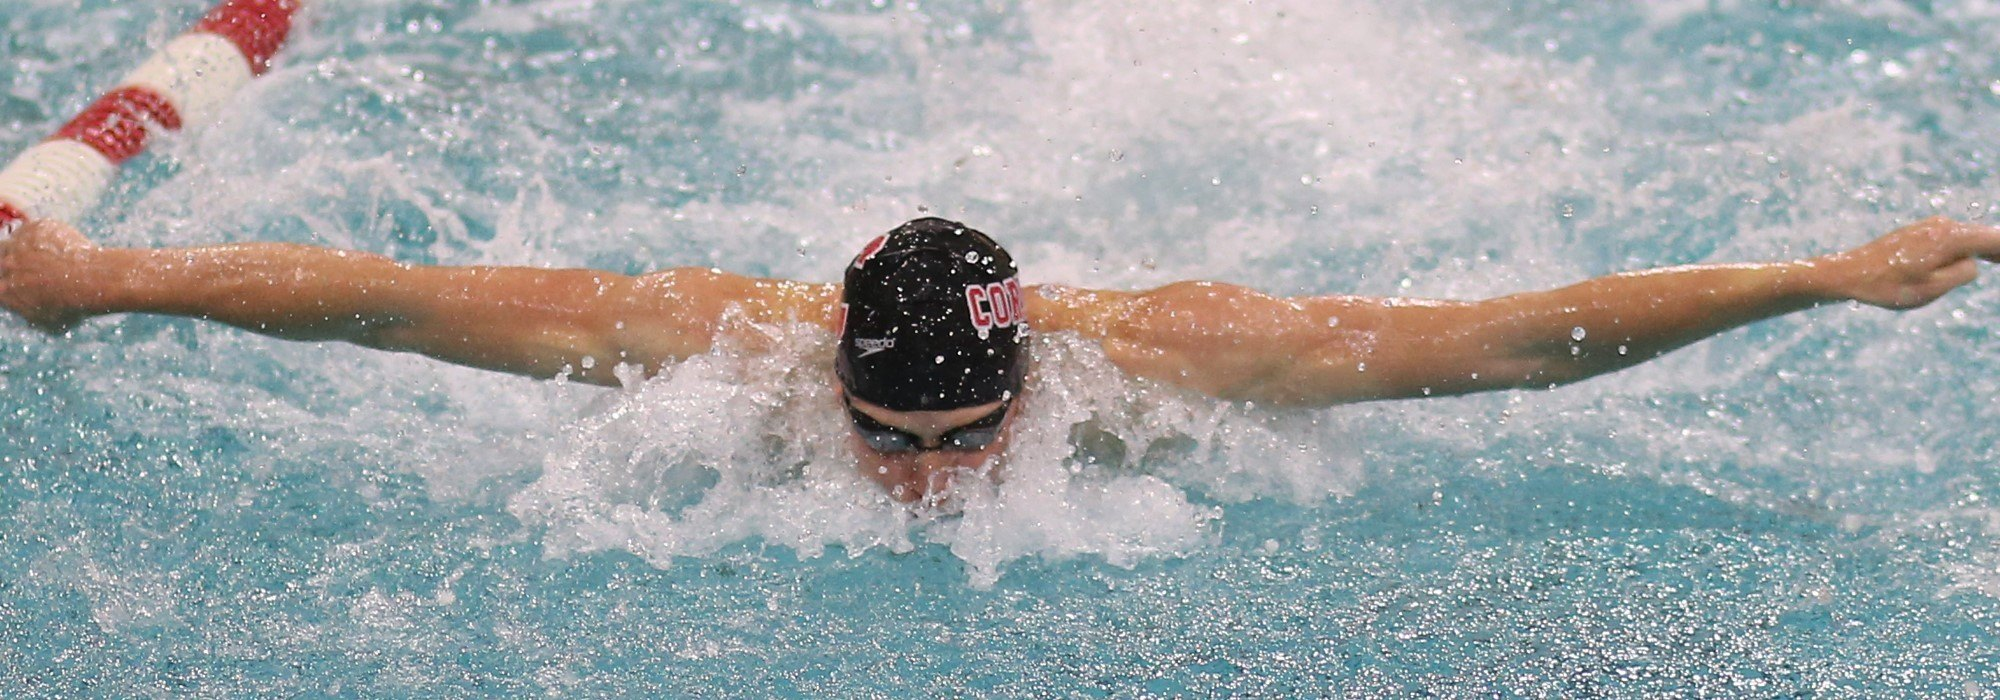 Cornell Posts 1-2-3-4-5-6-7 Finish in Men's 400 IM On Day 2 Of Zippy Invite